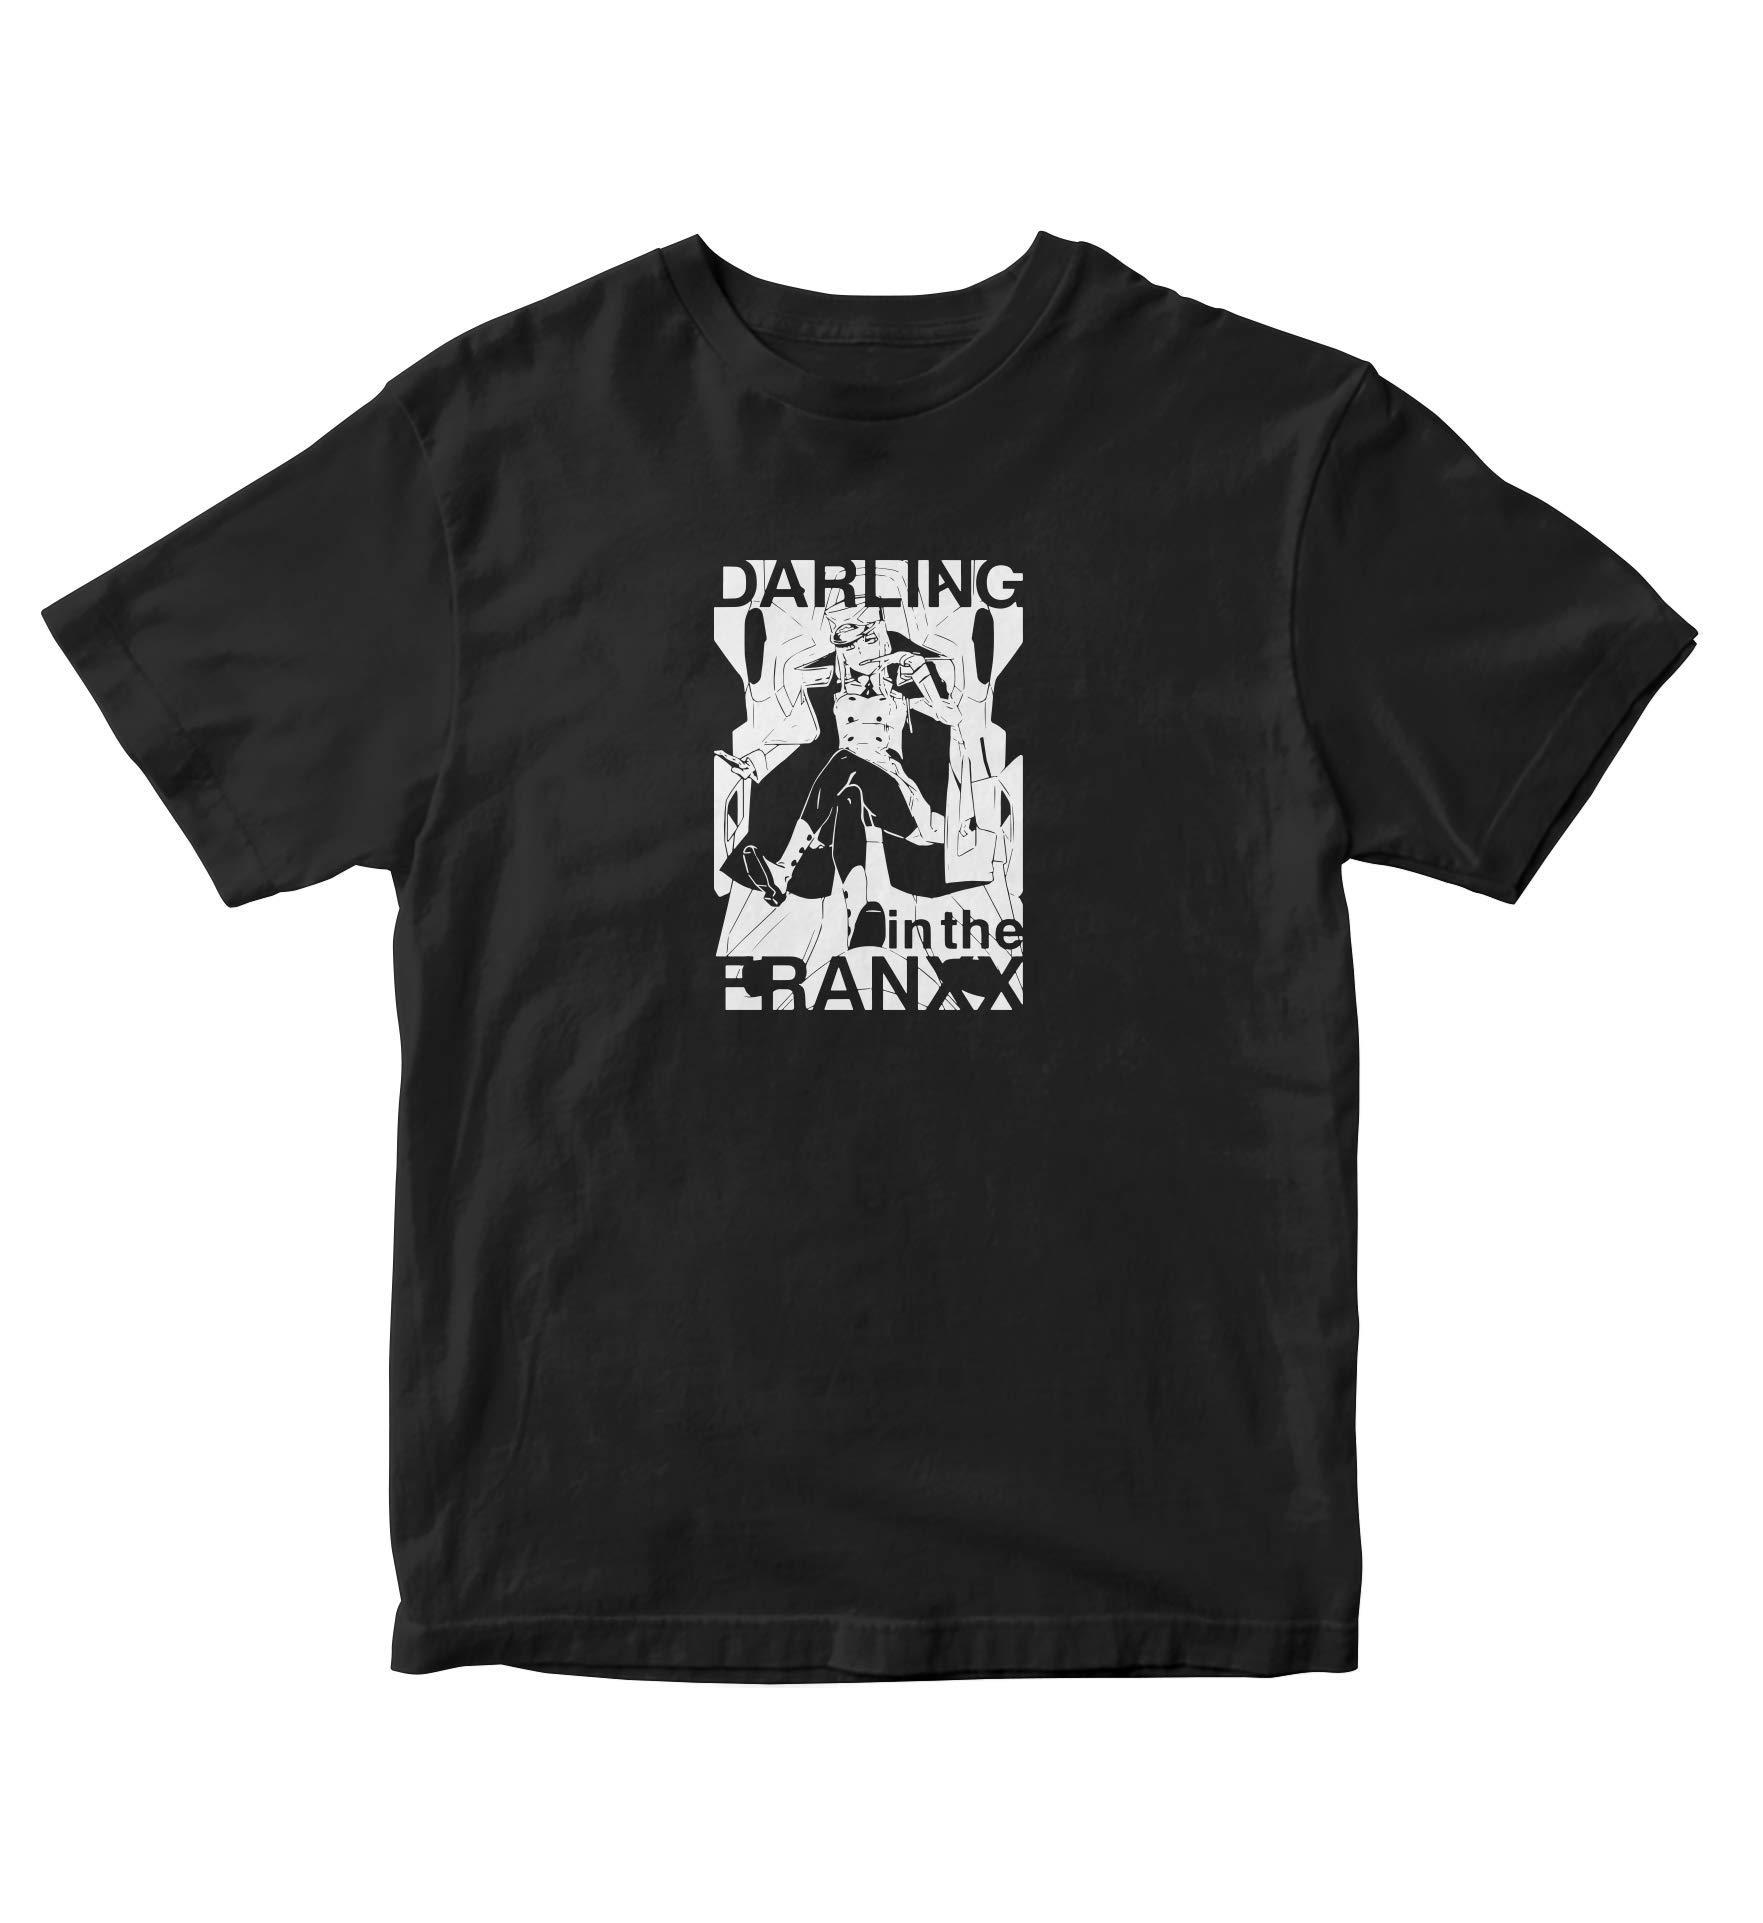 Zero Two Shirt Darling In The Franxx Anime Manga Man S Black A830